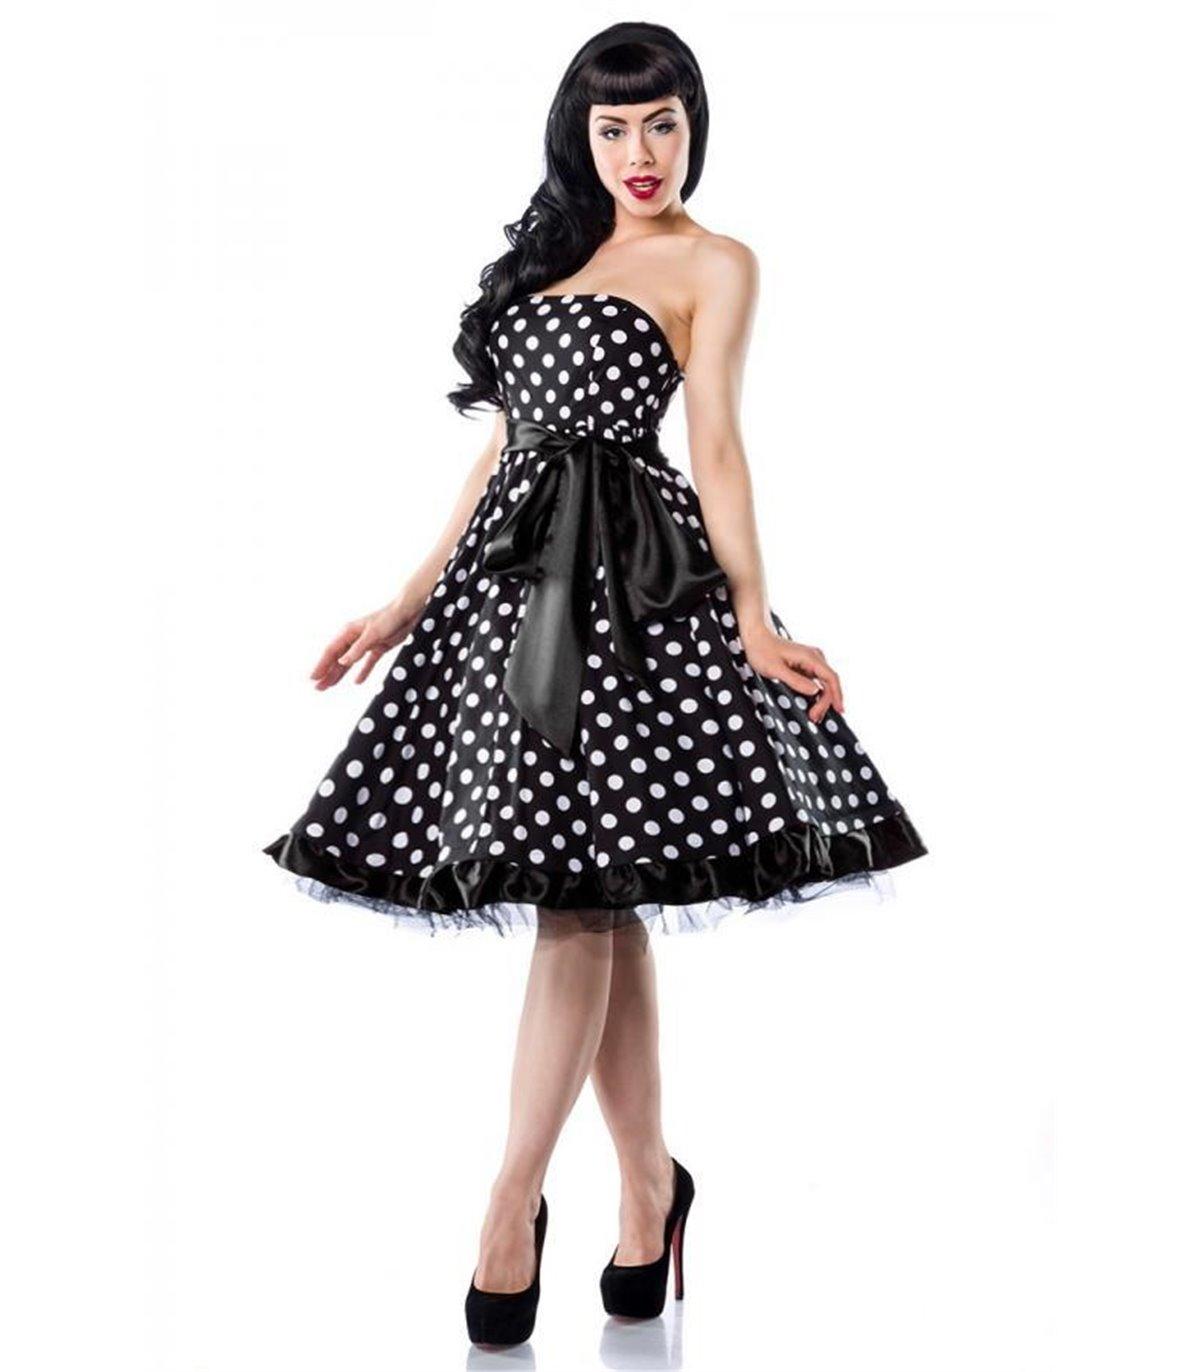 Sexy Rockabilly-Kleid - Kleider - Dresses 12655